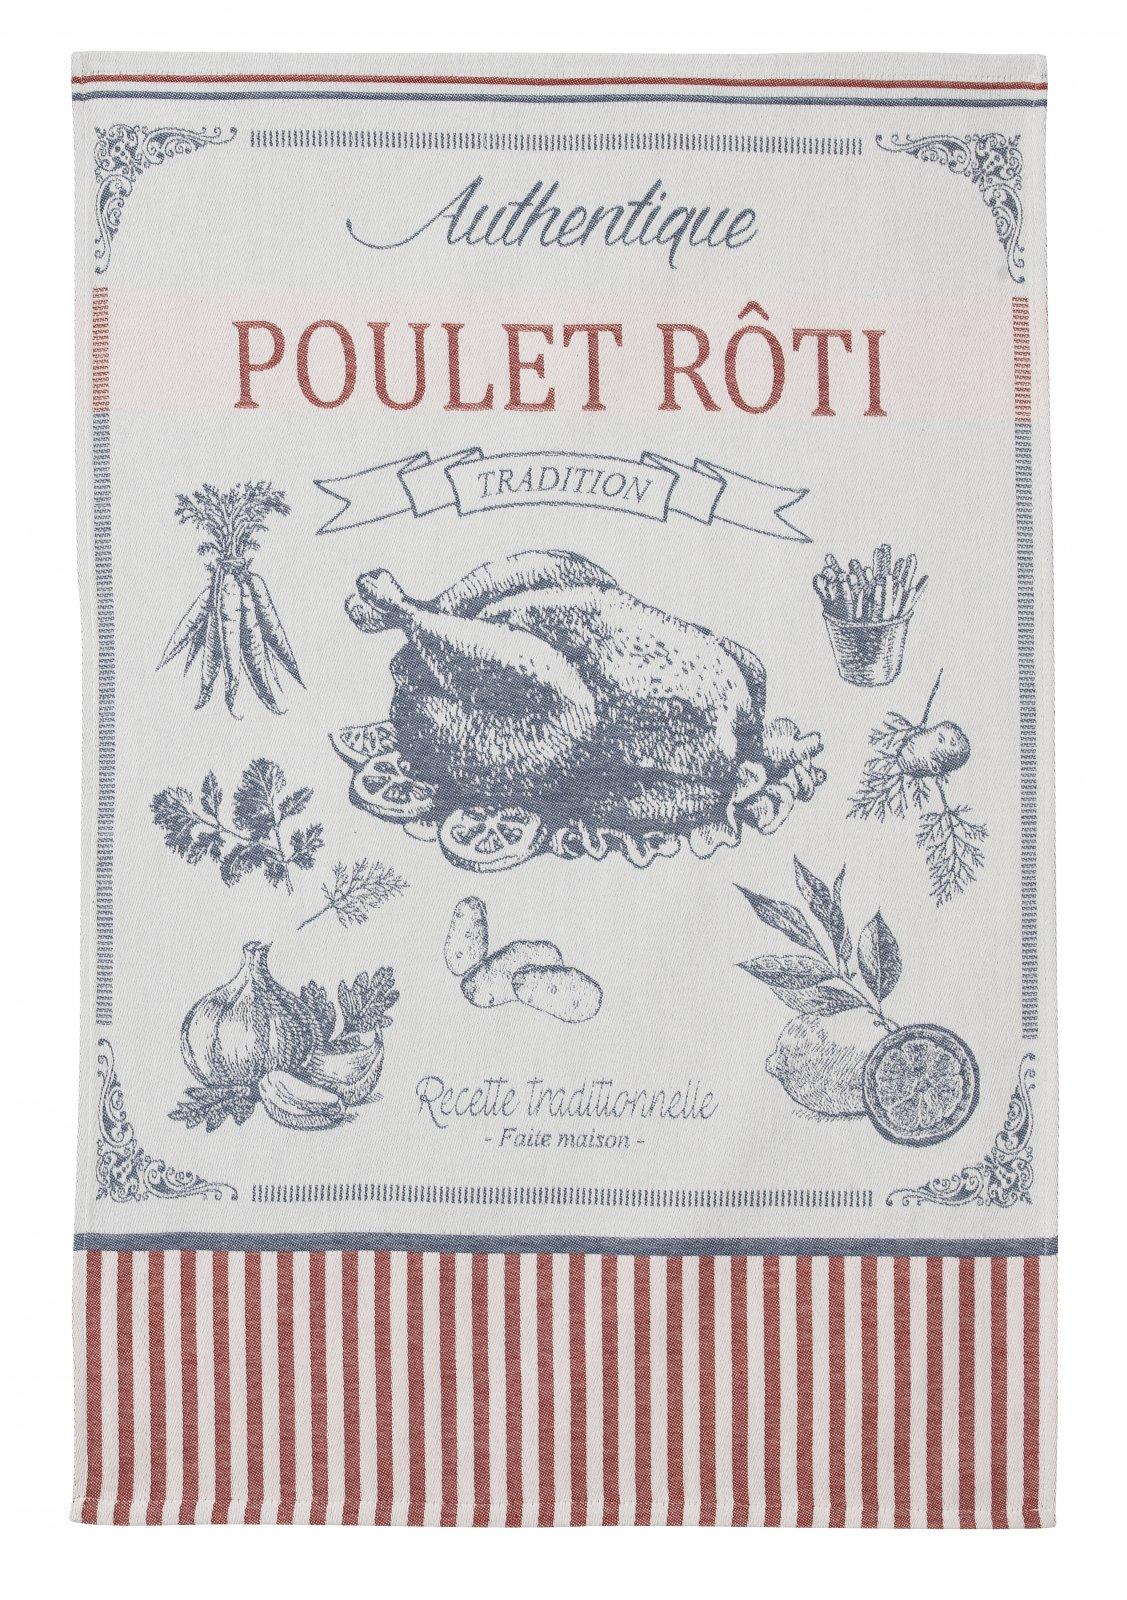 Coucke Poulet Roti tea towel